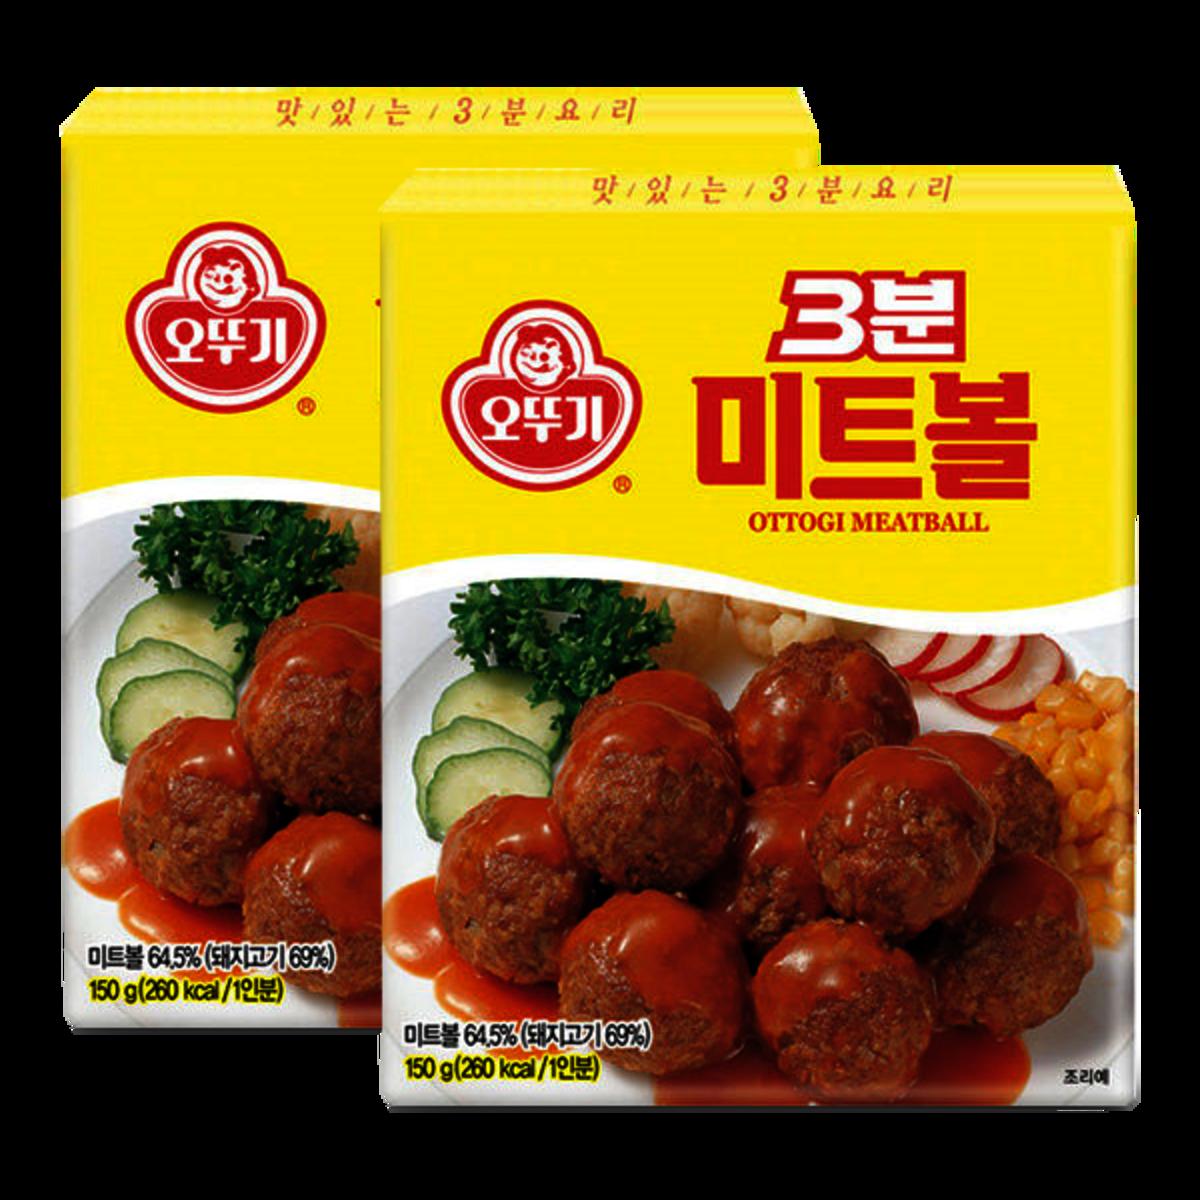 Ottogi 3 minutes Meat Ball 150gX2